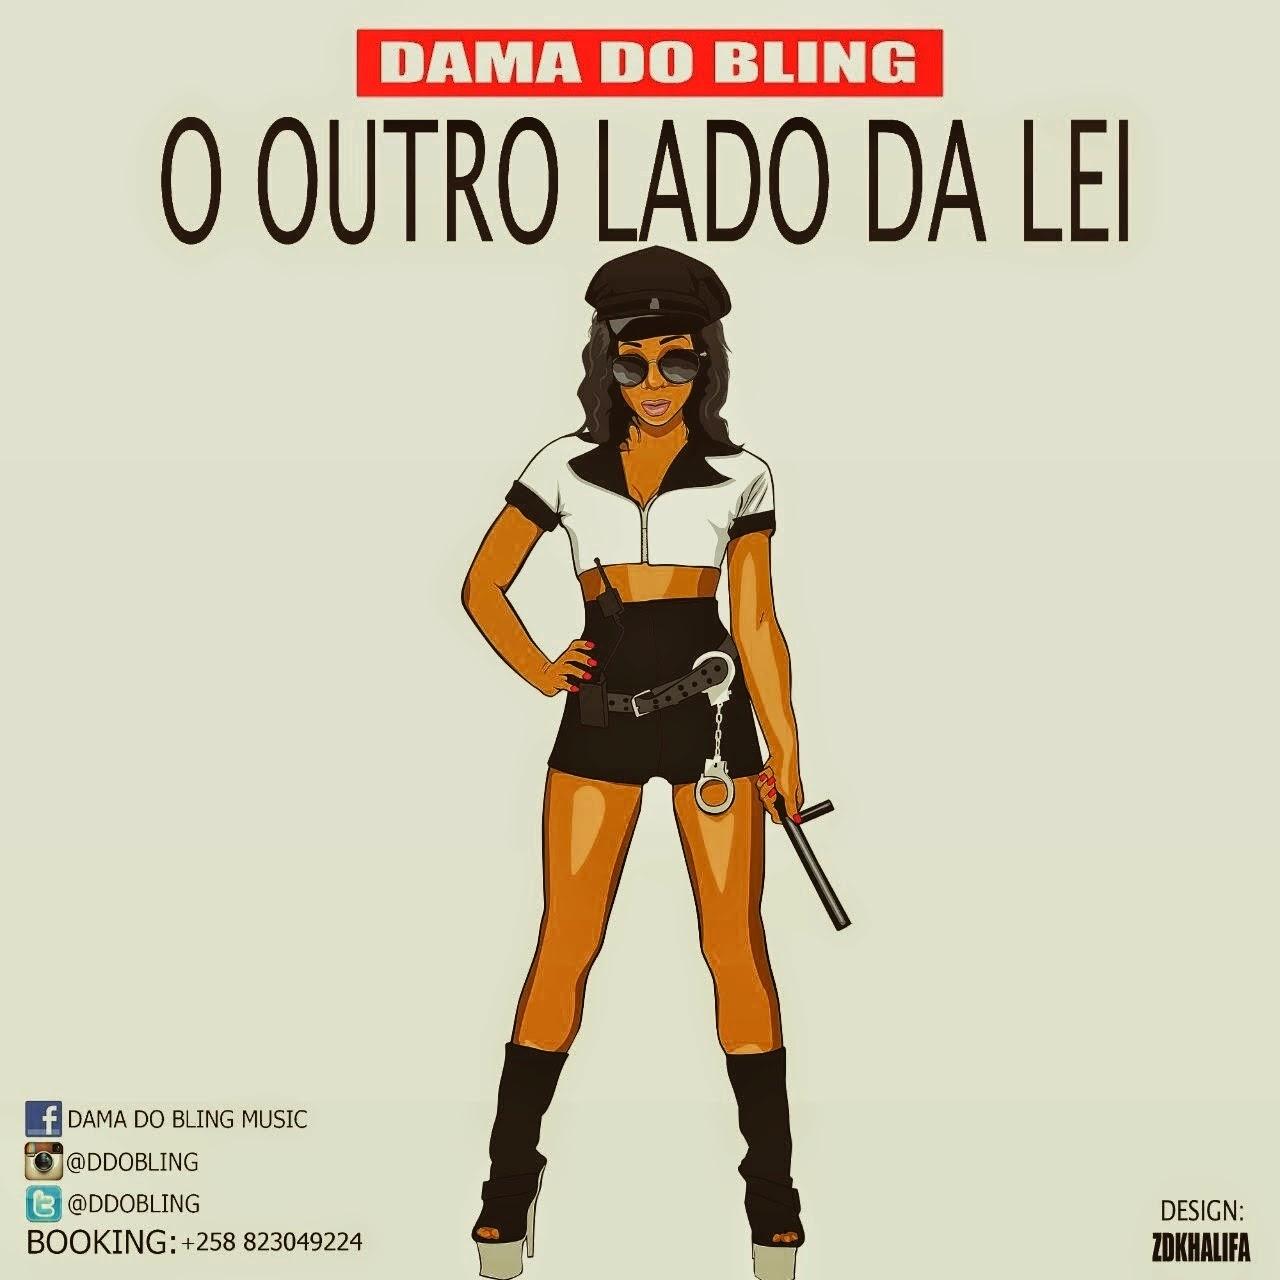 DAMA DO BLING - O OUTRO LADO DA LEI - (DOWNLOAD)